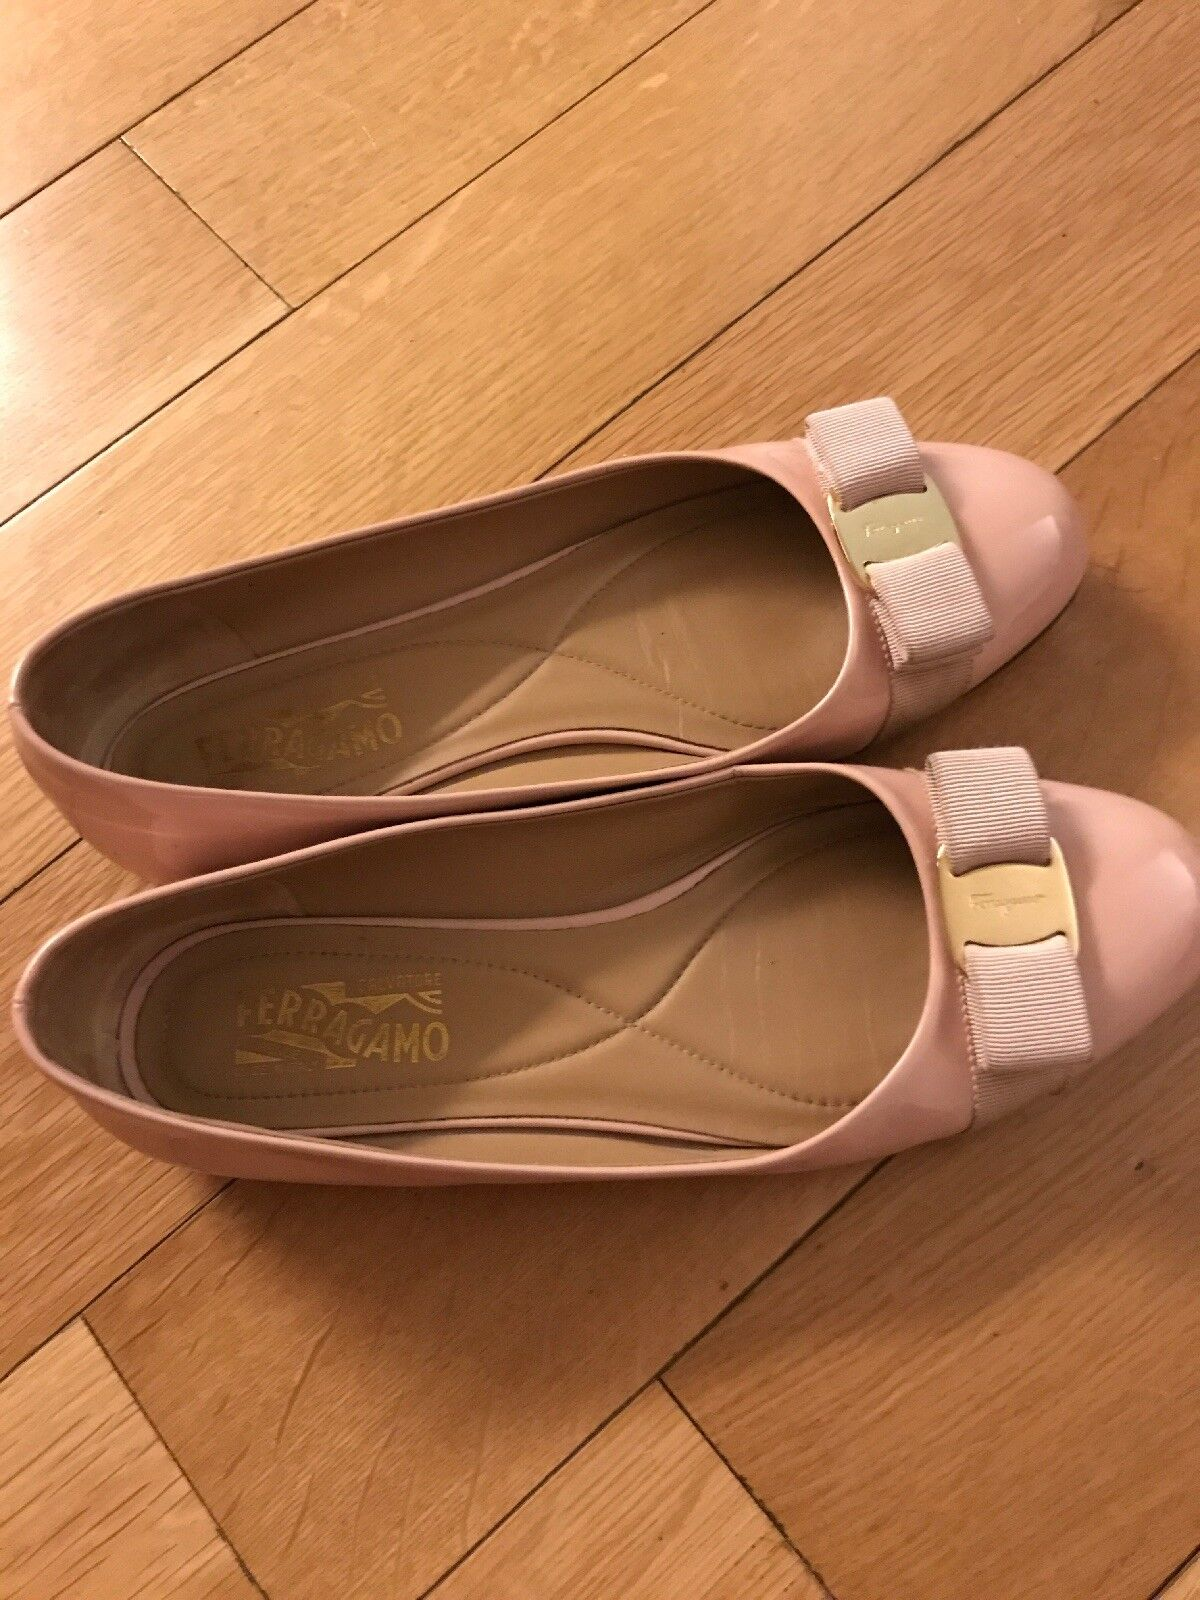 Ferragamo Varina ballet 10 in New Bisque Bisque Bisque patent leather in box f28b16